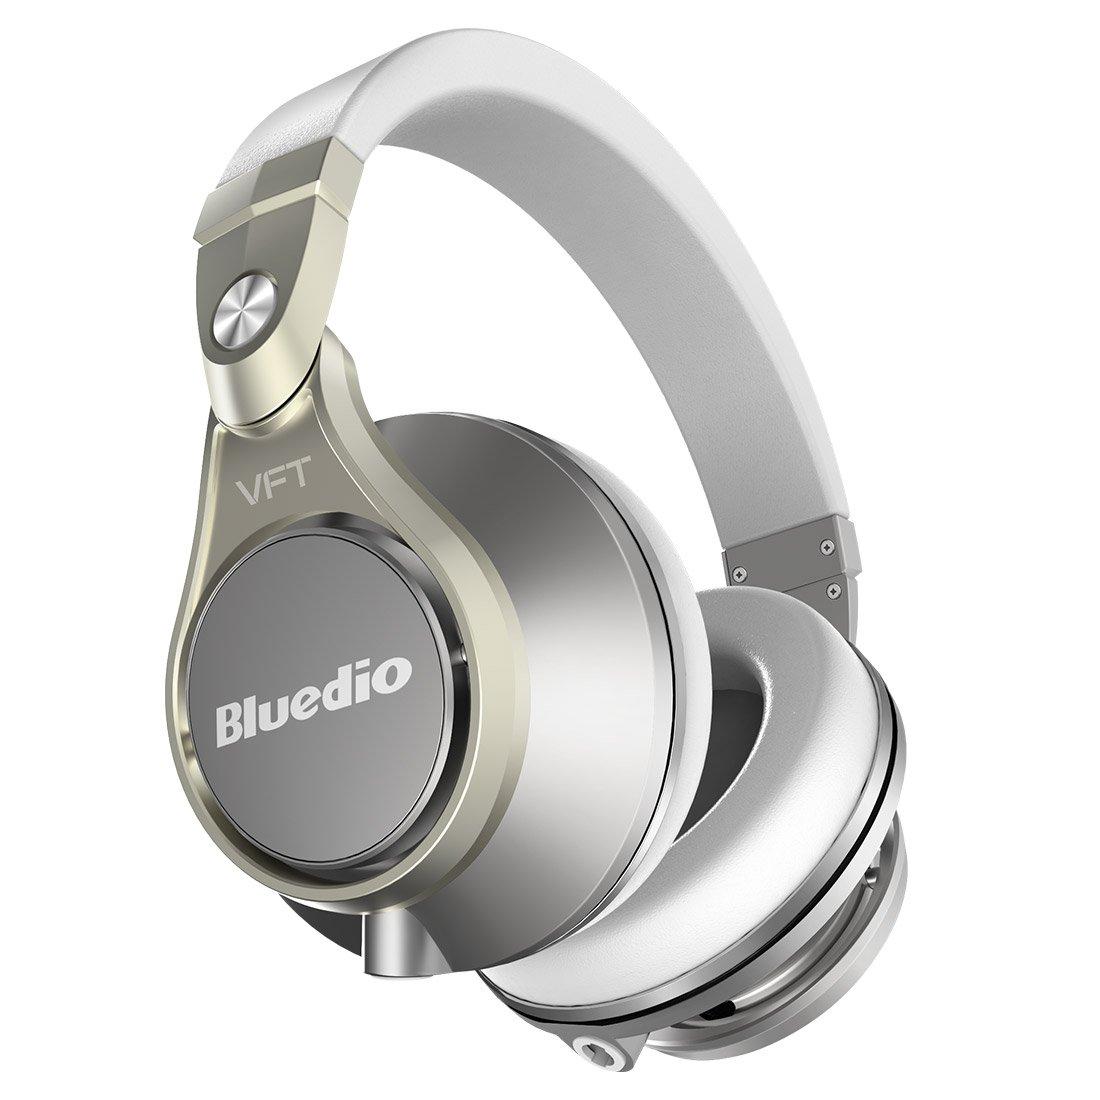 Bluedio U Plus (UFO) Extra Bass Wireless Bluetooth PPS12 Drivers Over-Ear DJ Headphones (White)